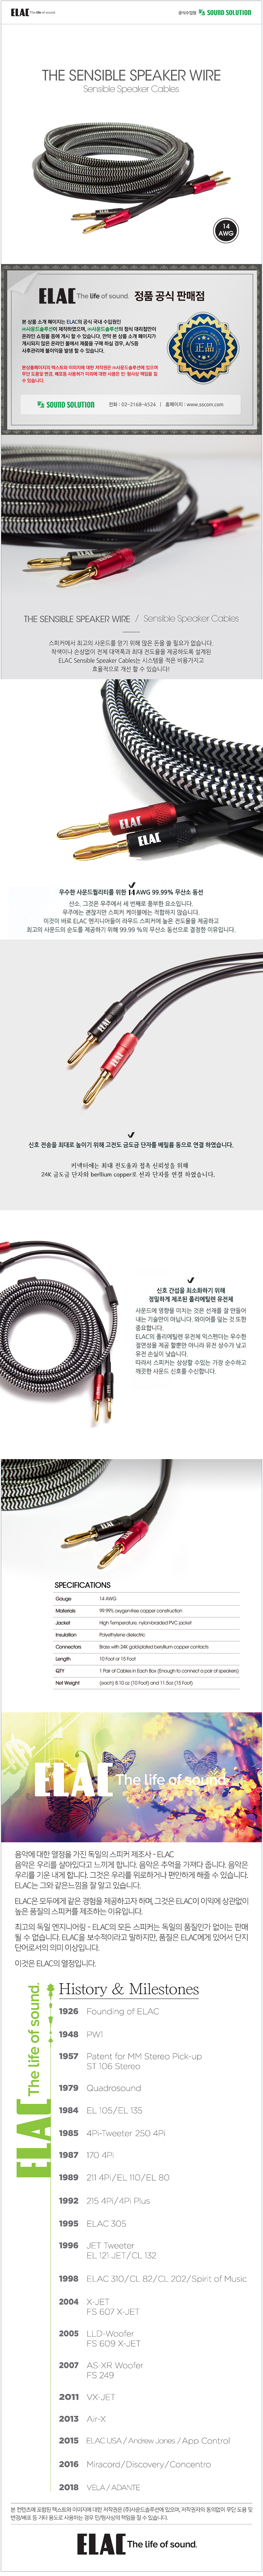 Sensible Cables-1_개정판.jpg